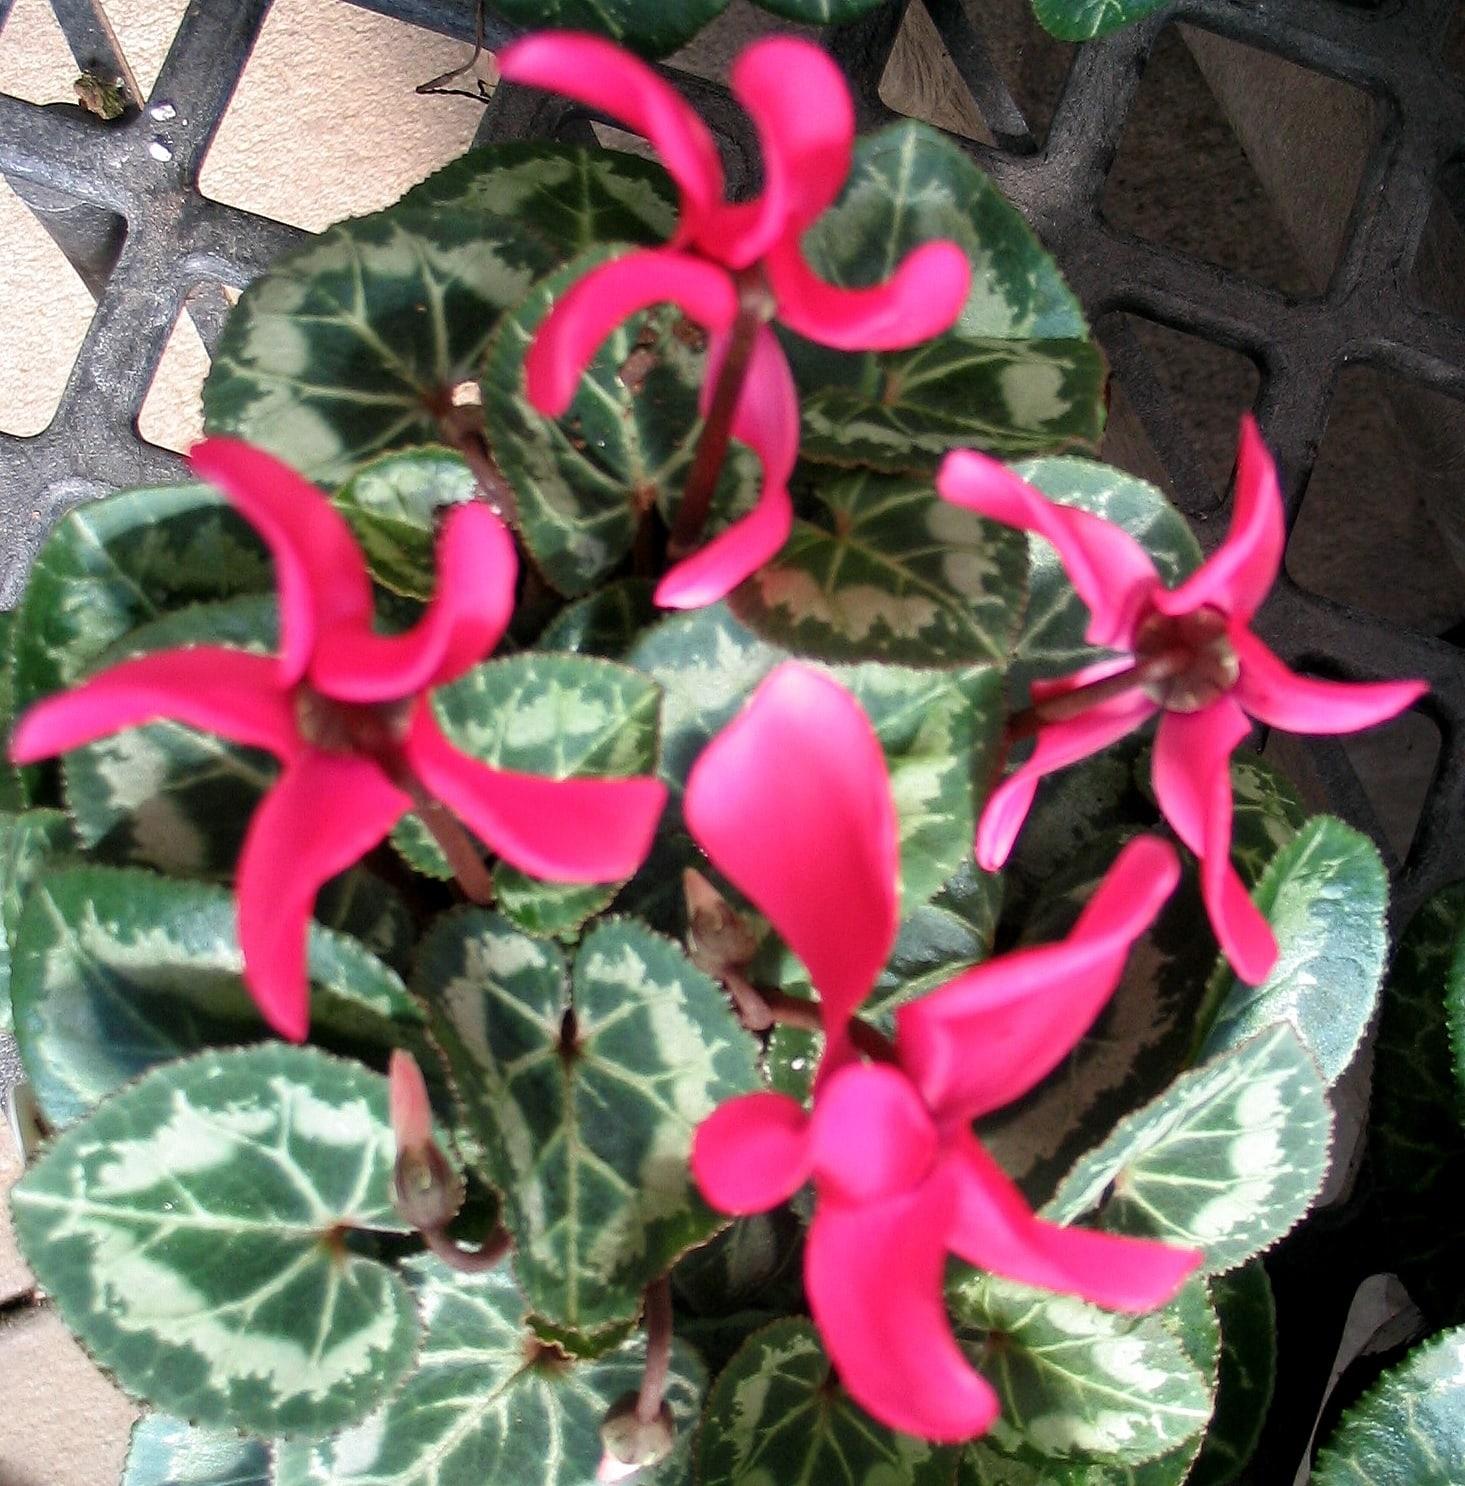 Красные цветы цикламена